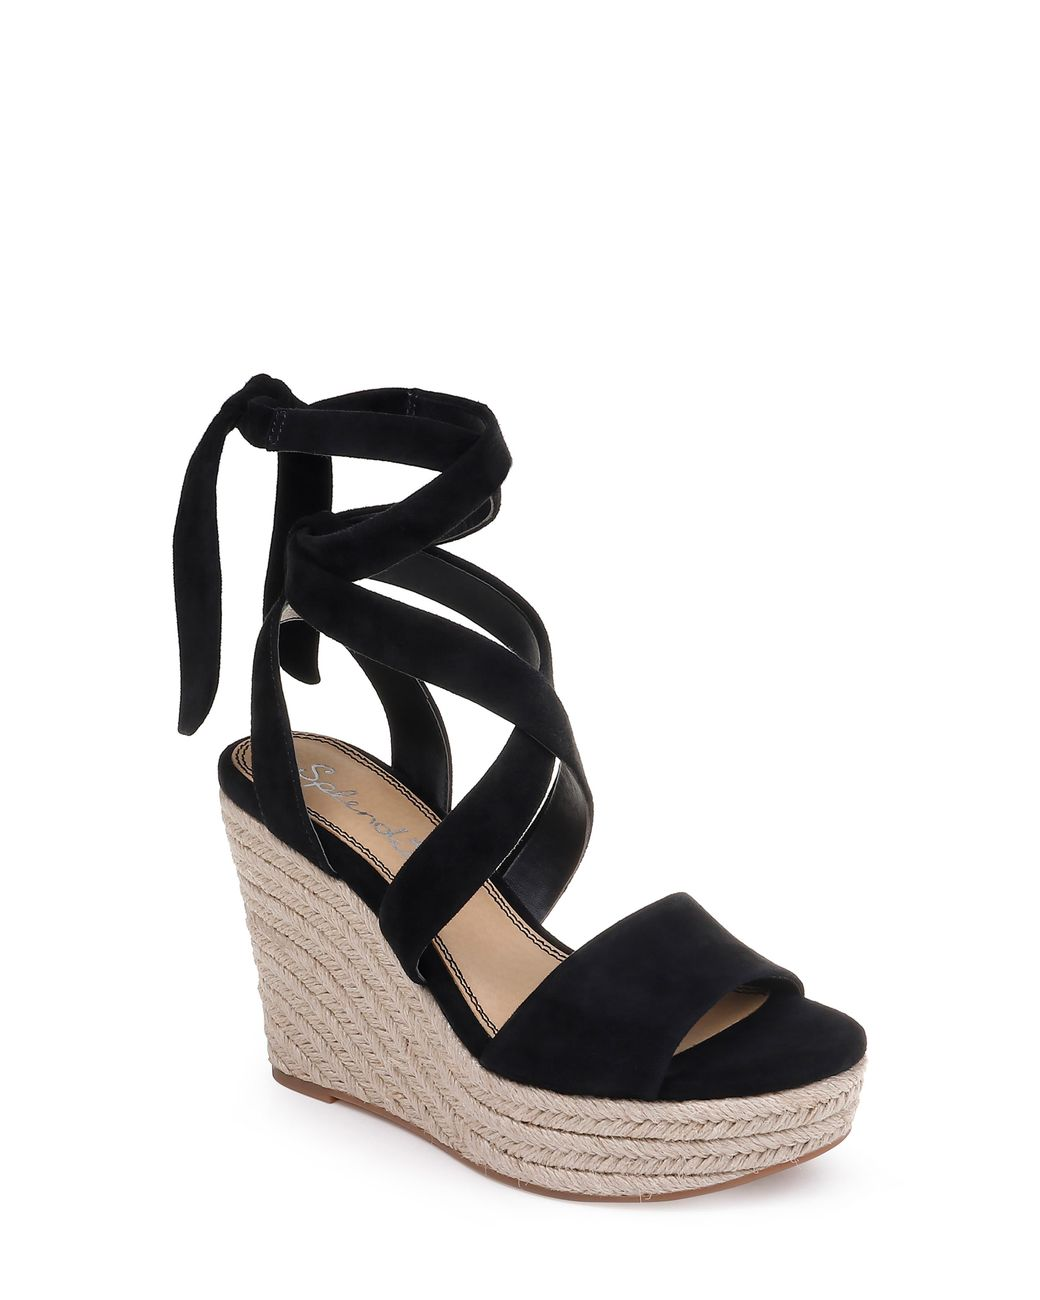 2c84beff1ba Black Women's Tessie Ankle - Tie Wedge Sandals